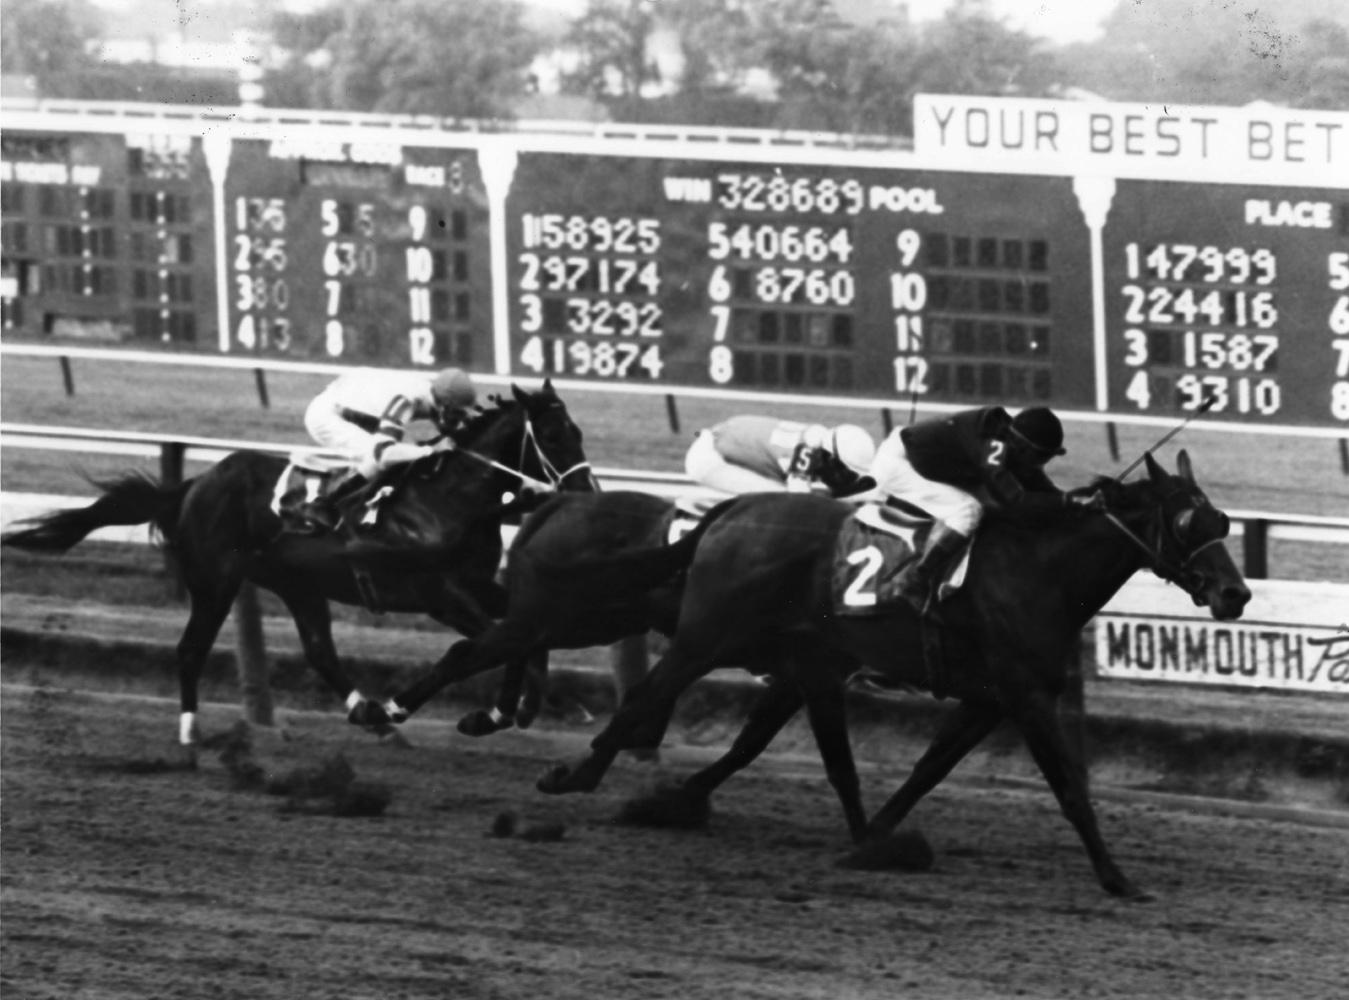 Buckpasser (Braulio Baeza up) winning the 1965 Sapling Stakes at Monmouth Park (Jim Raftery Turfotos/Museum Collection)